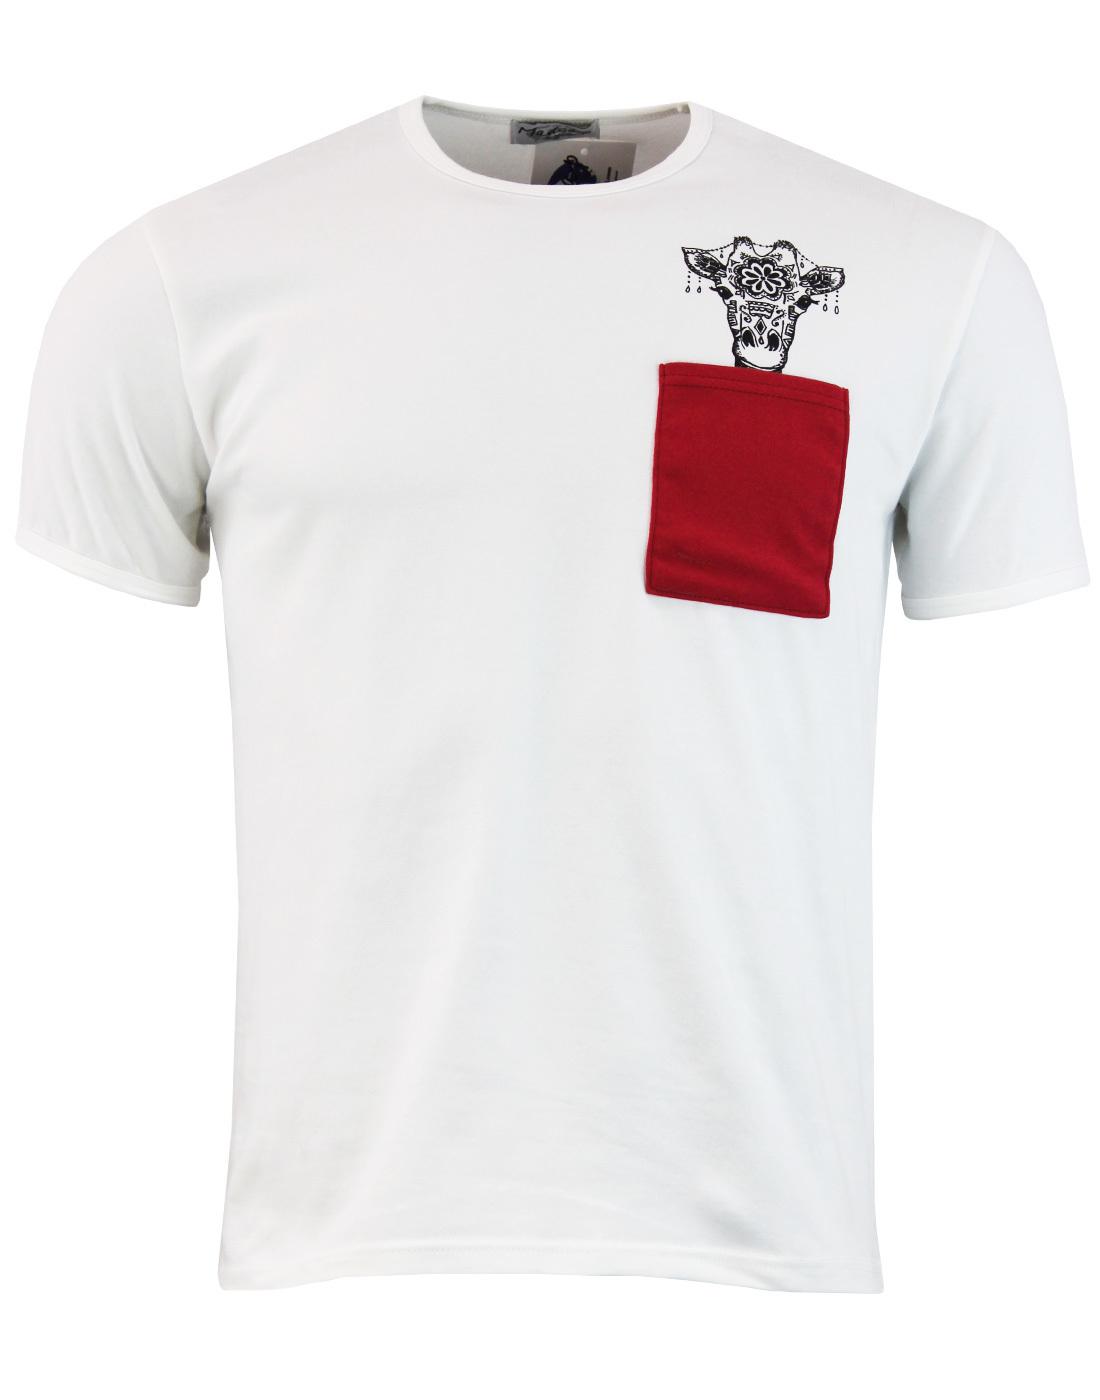 madcap giraffe pocket t shirt white mod